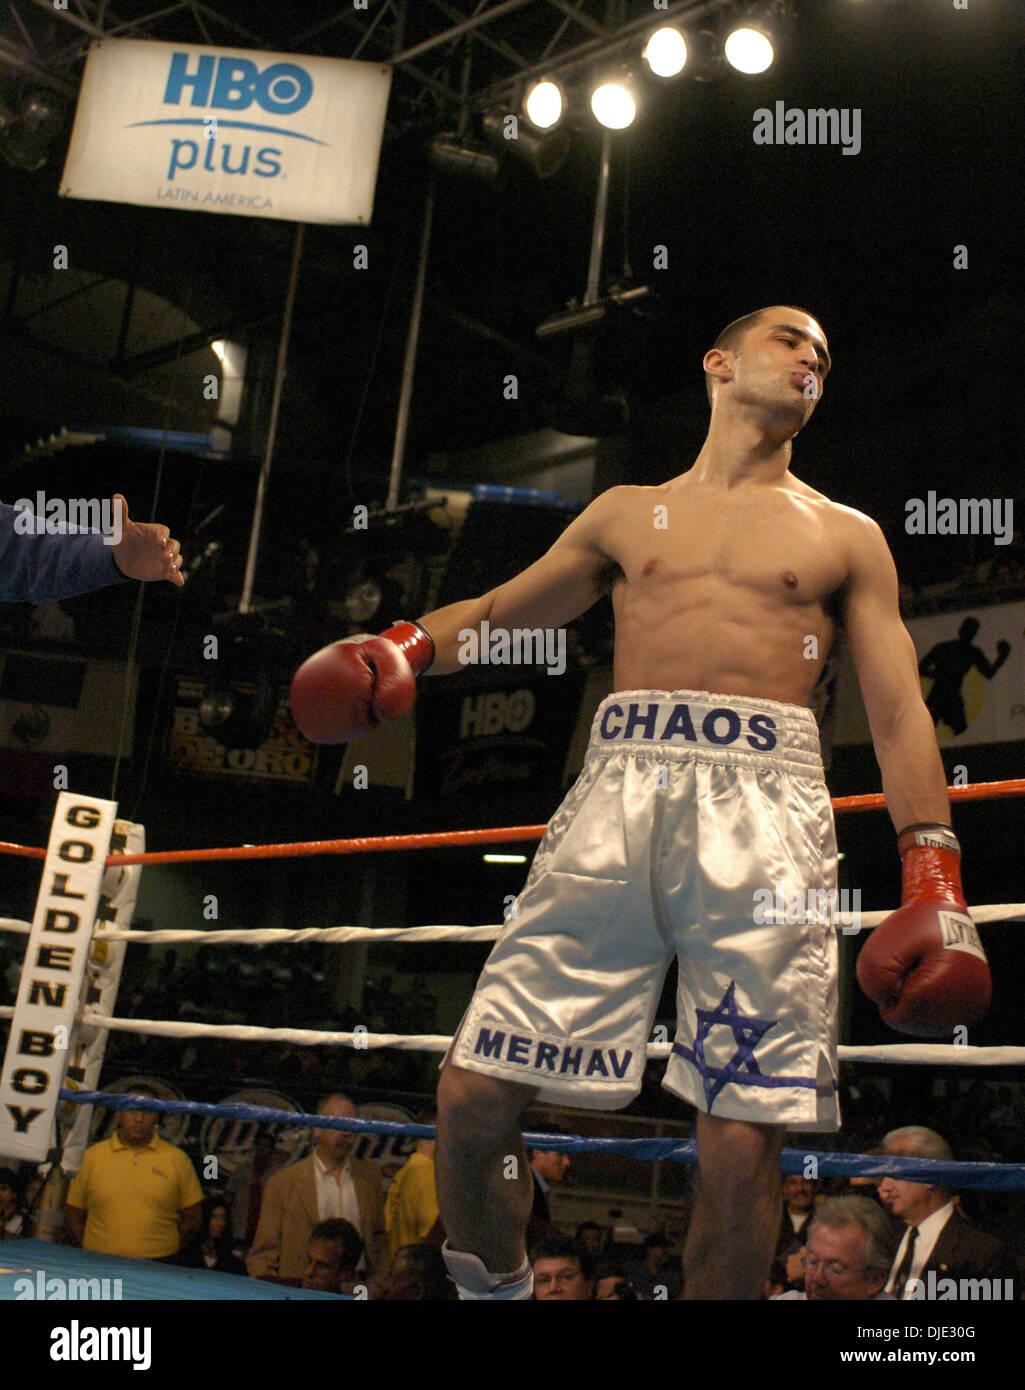 5dac6a94955e ... boxer MERHAV MOHAR defeated Eddie Cota during Oscar De La Hoya s golden  Boy Promotion s  Boxeo De Oro  series at the Olympic Auditorium in Los  Angeles.